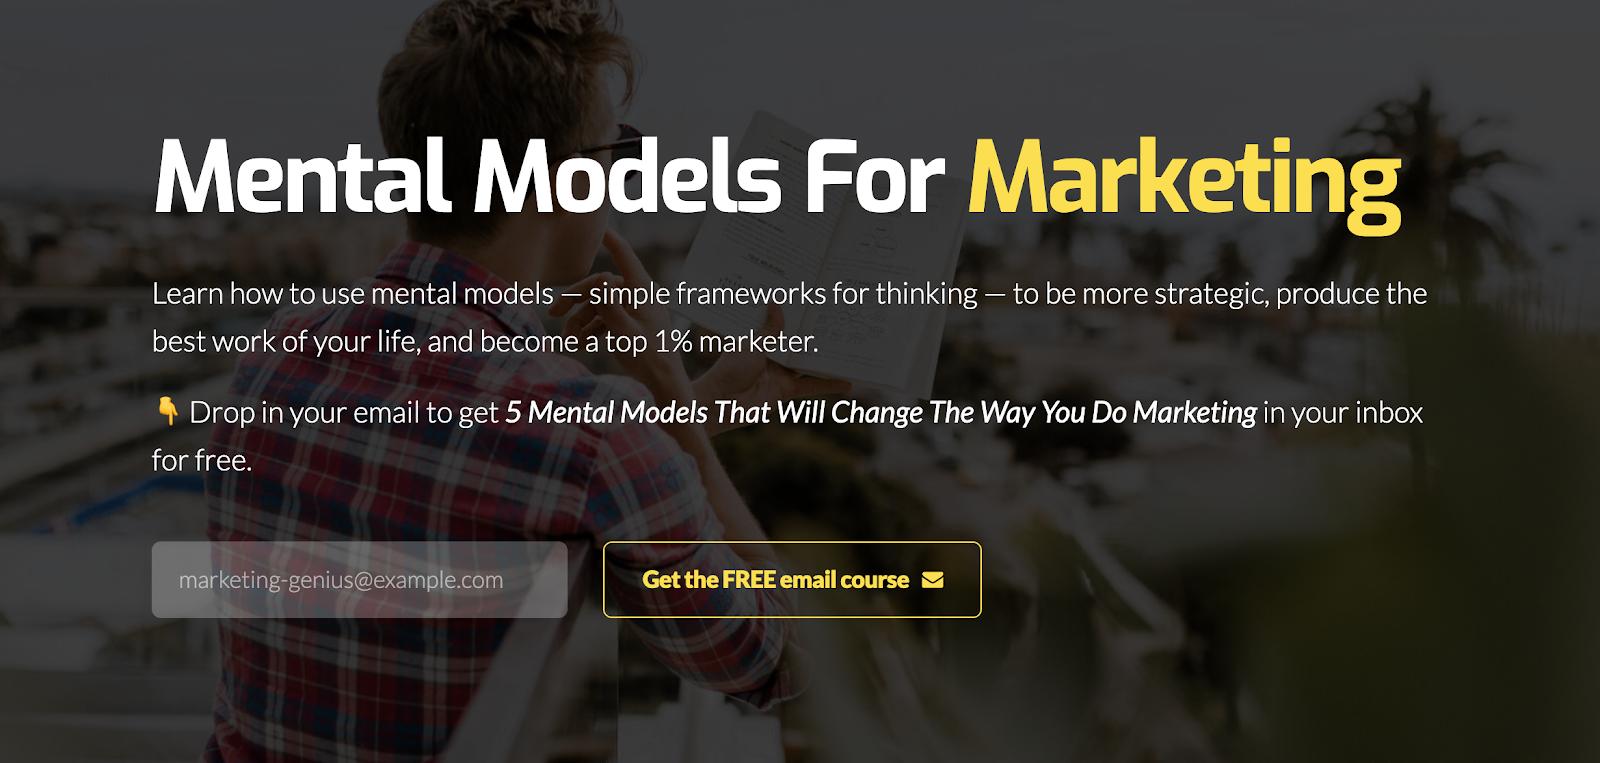 Entrepreneur online courses #11: Mental Models For Marketing